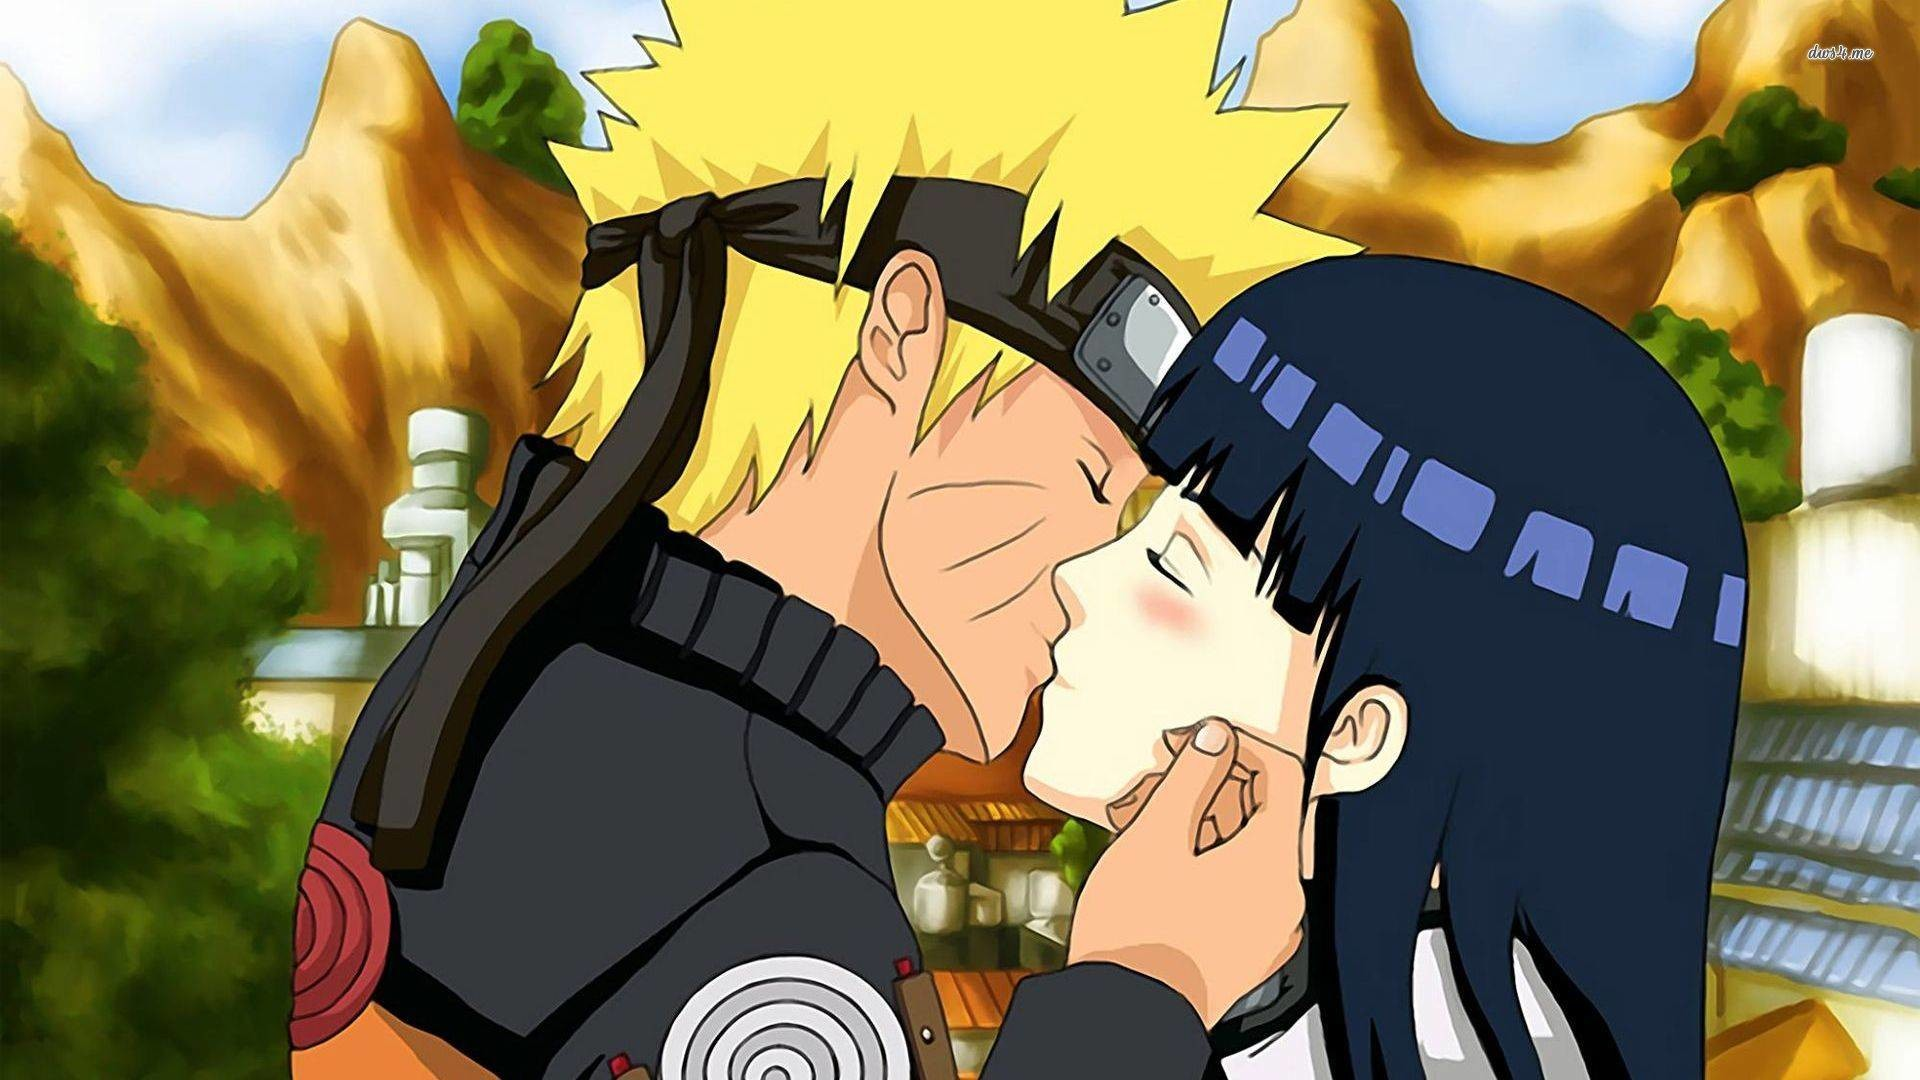 Naruto Und Hinata Wallpaper 4k - Novocom.top